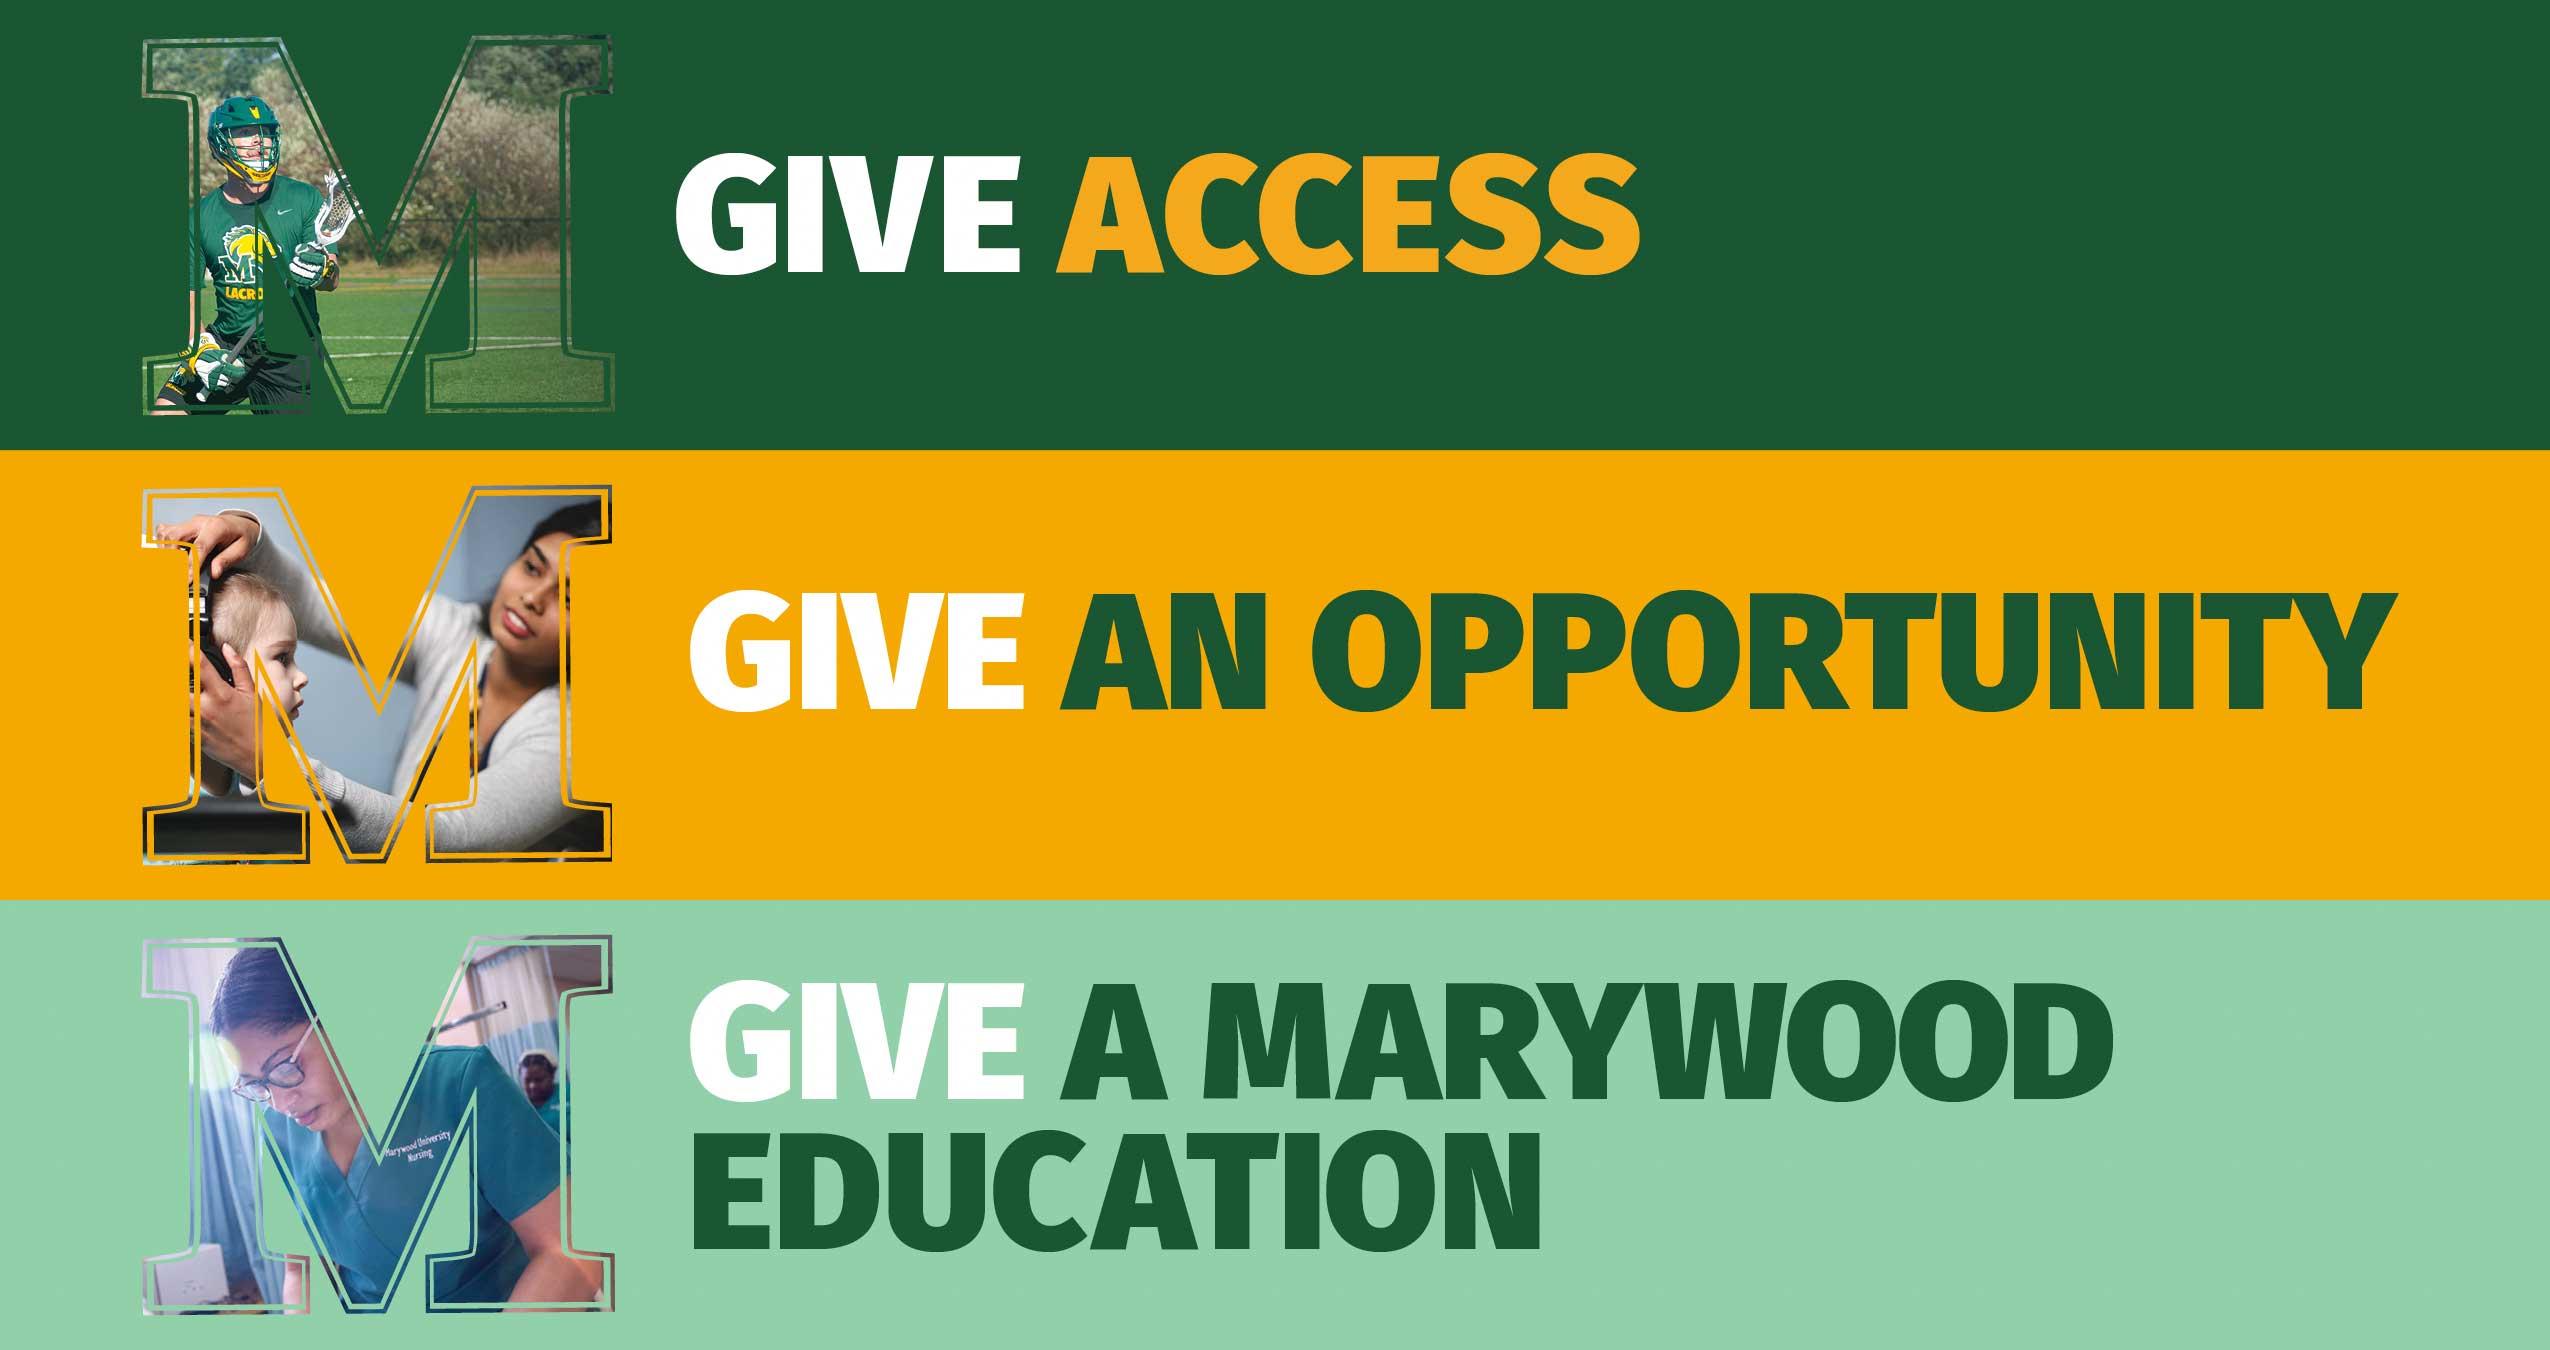 Marywood University Make a Gift 2021